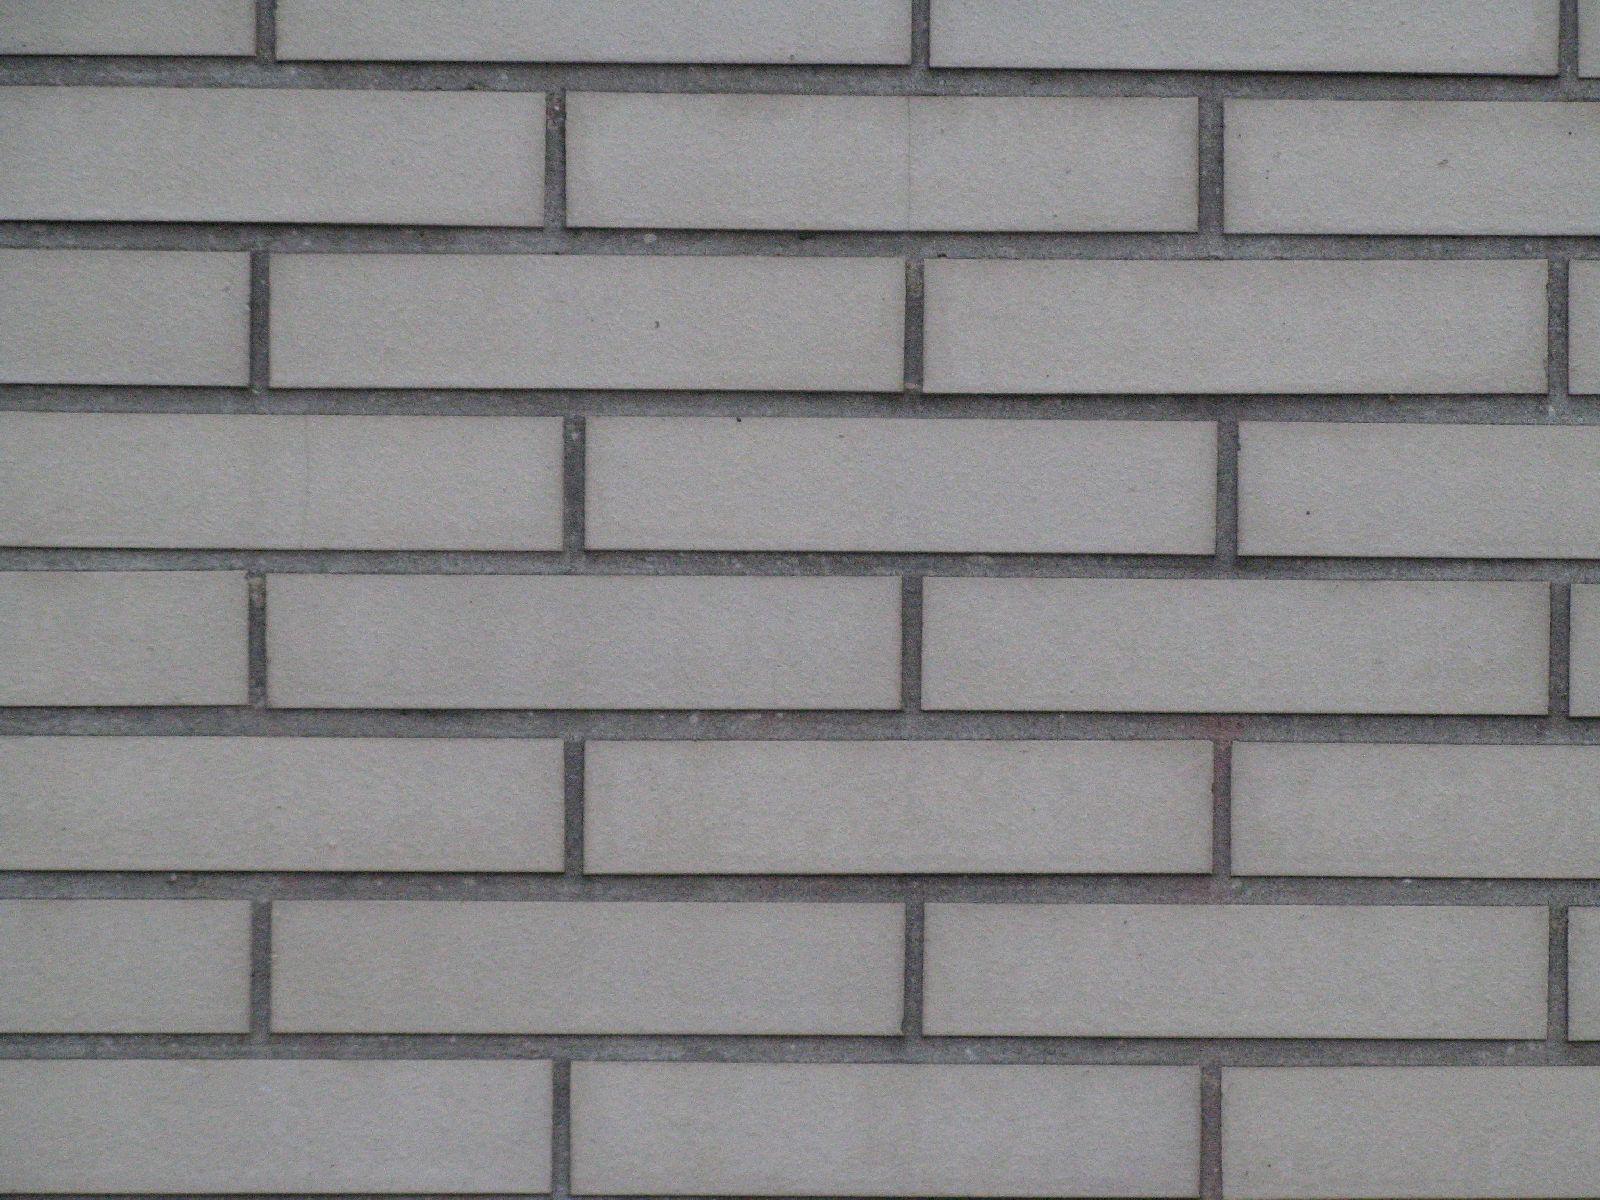 Brick_Texture_B_5862